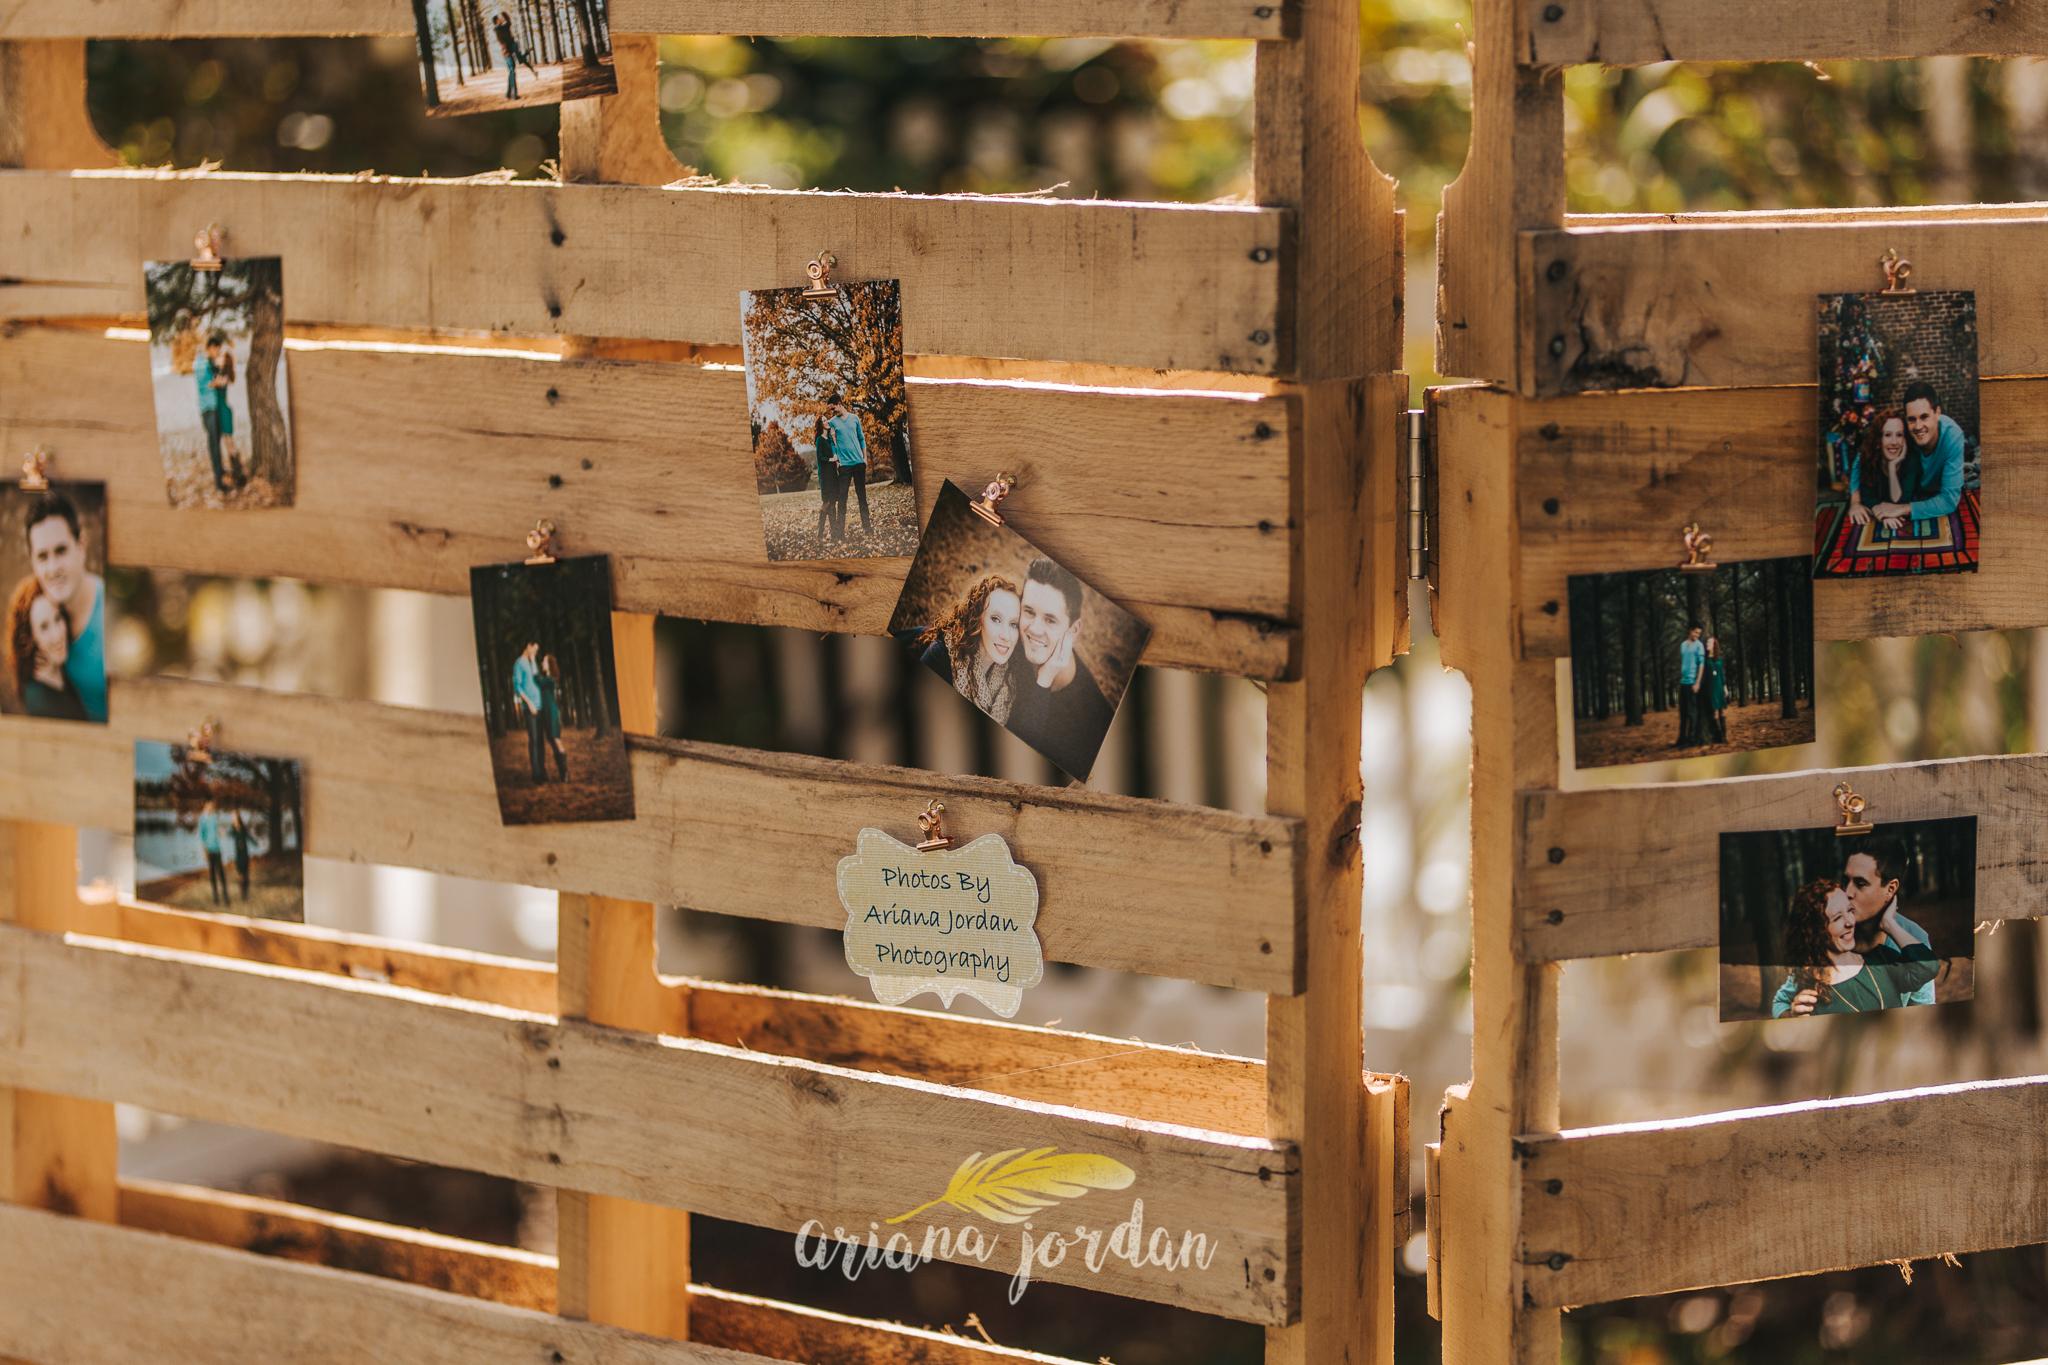 003 Ariana Jordan Photography -Moonlight Fields Lexington Ky Wedding Photographer 4048.jpg